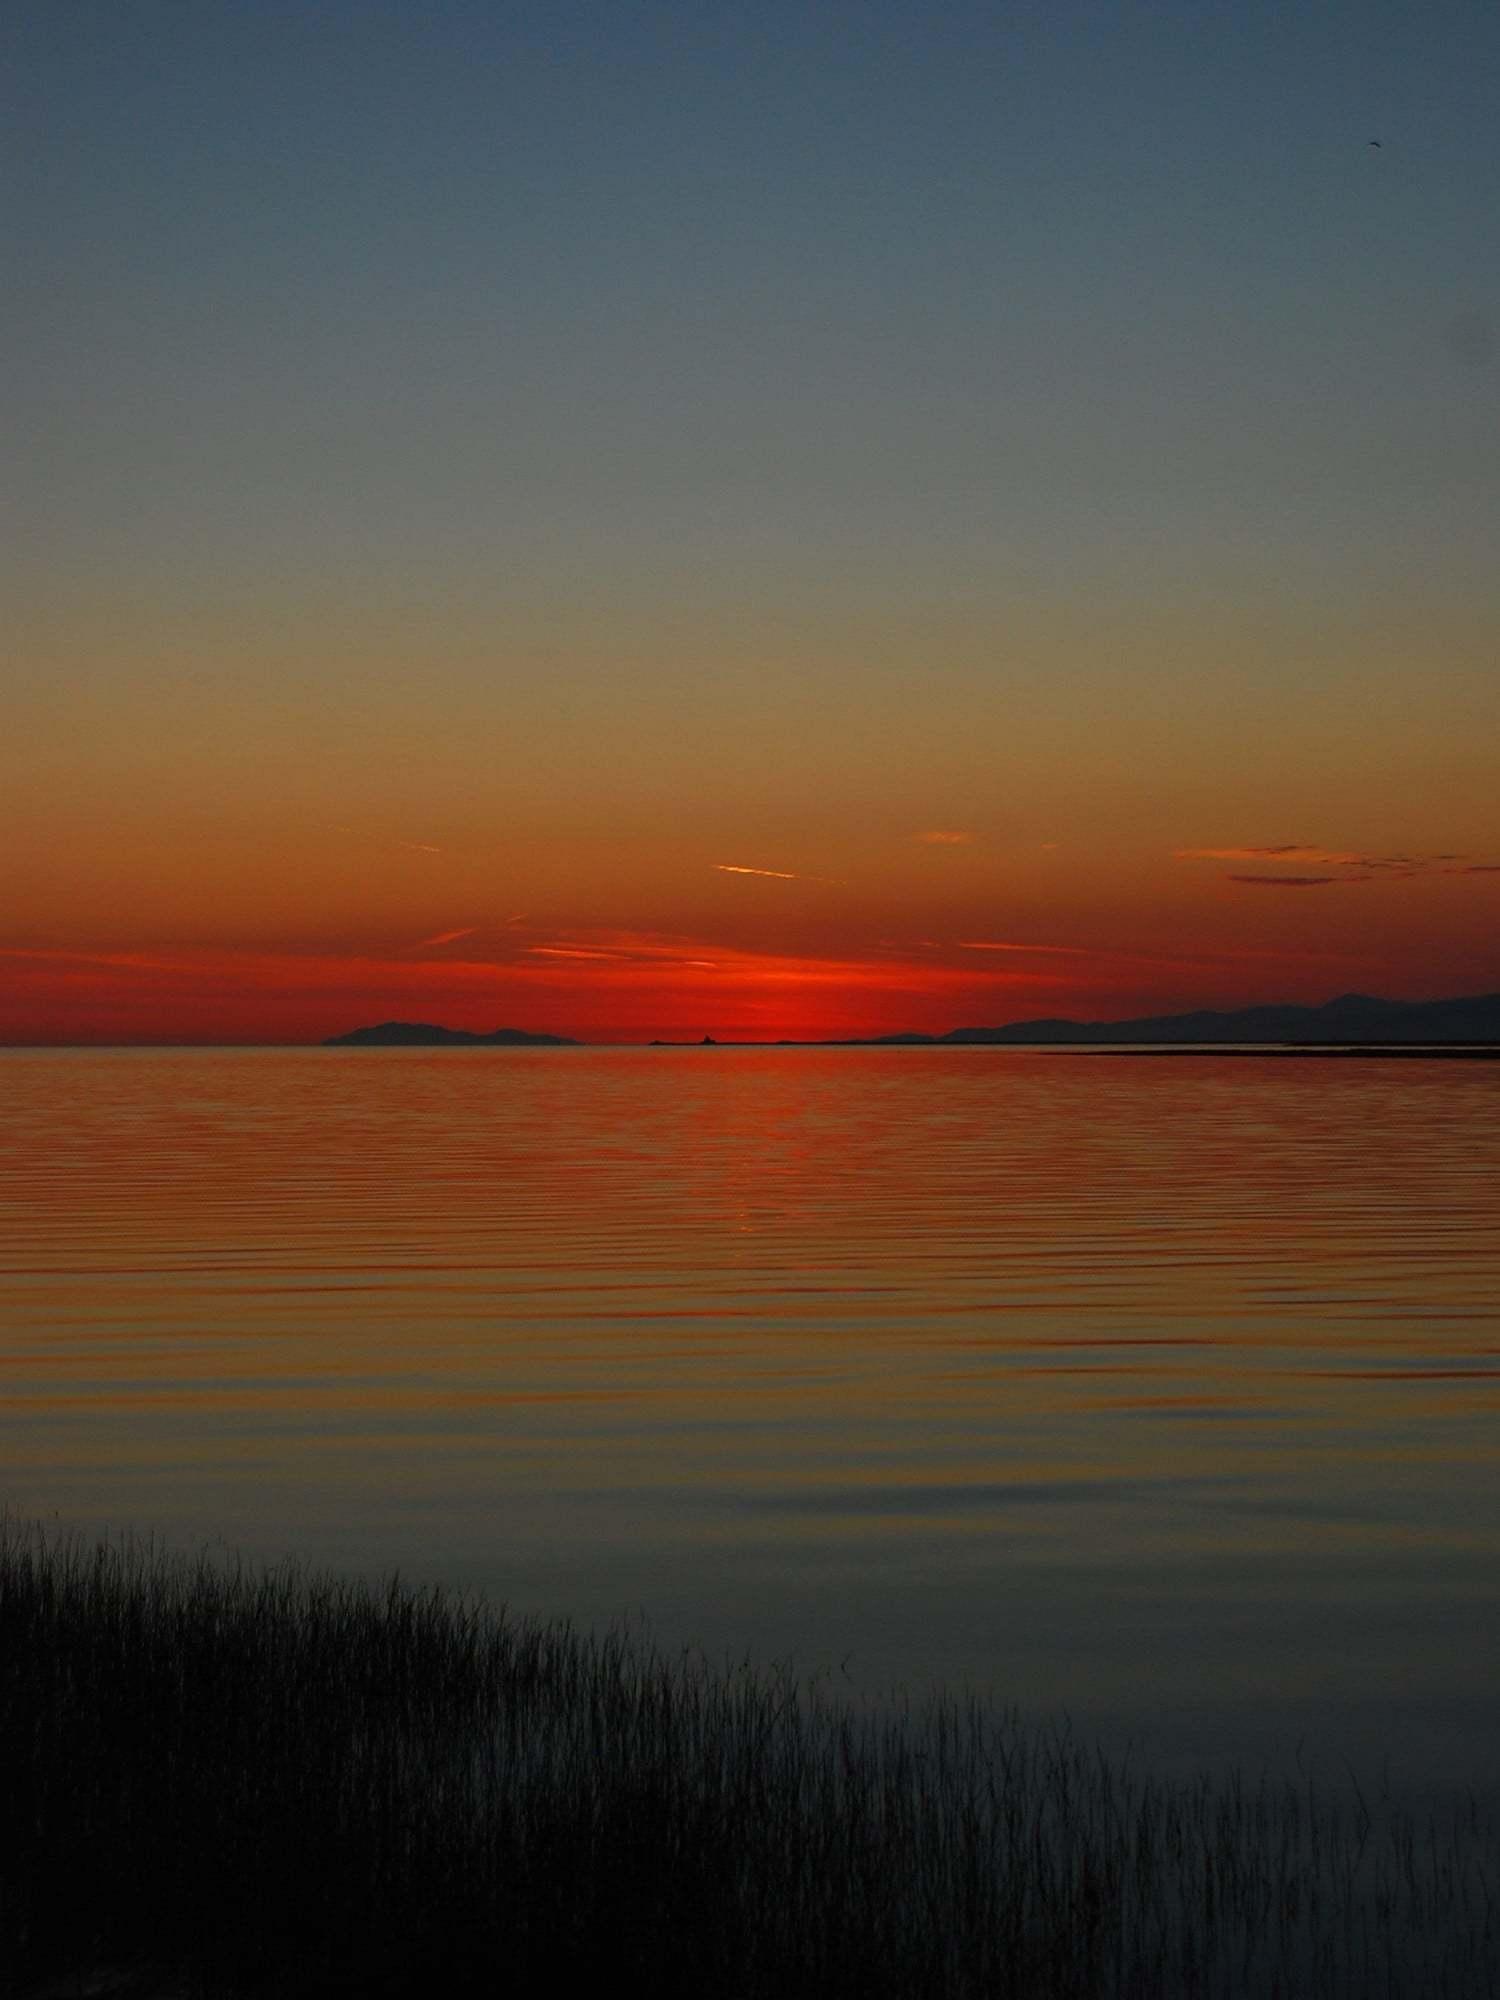 gün batımı manzaraları – 4